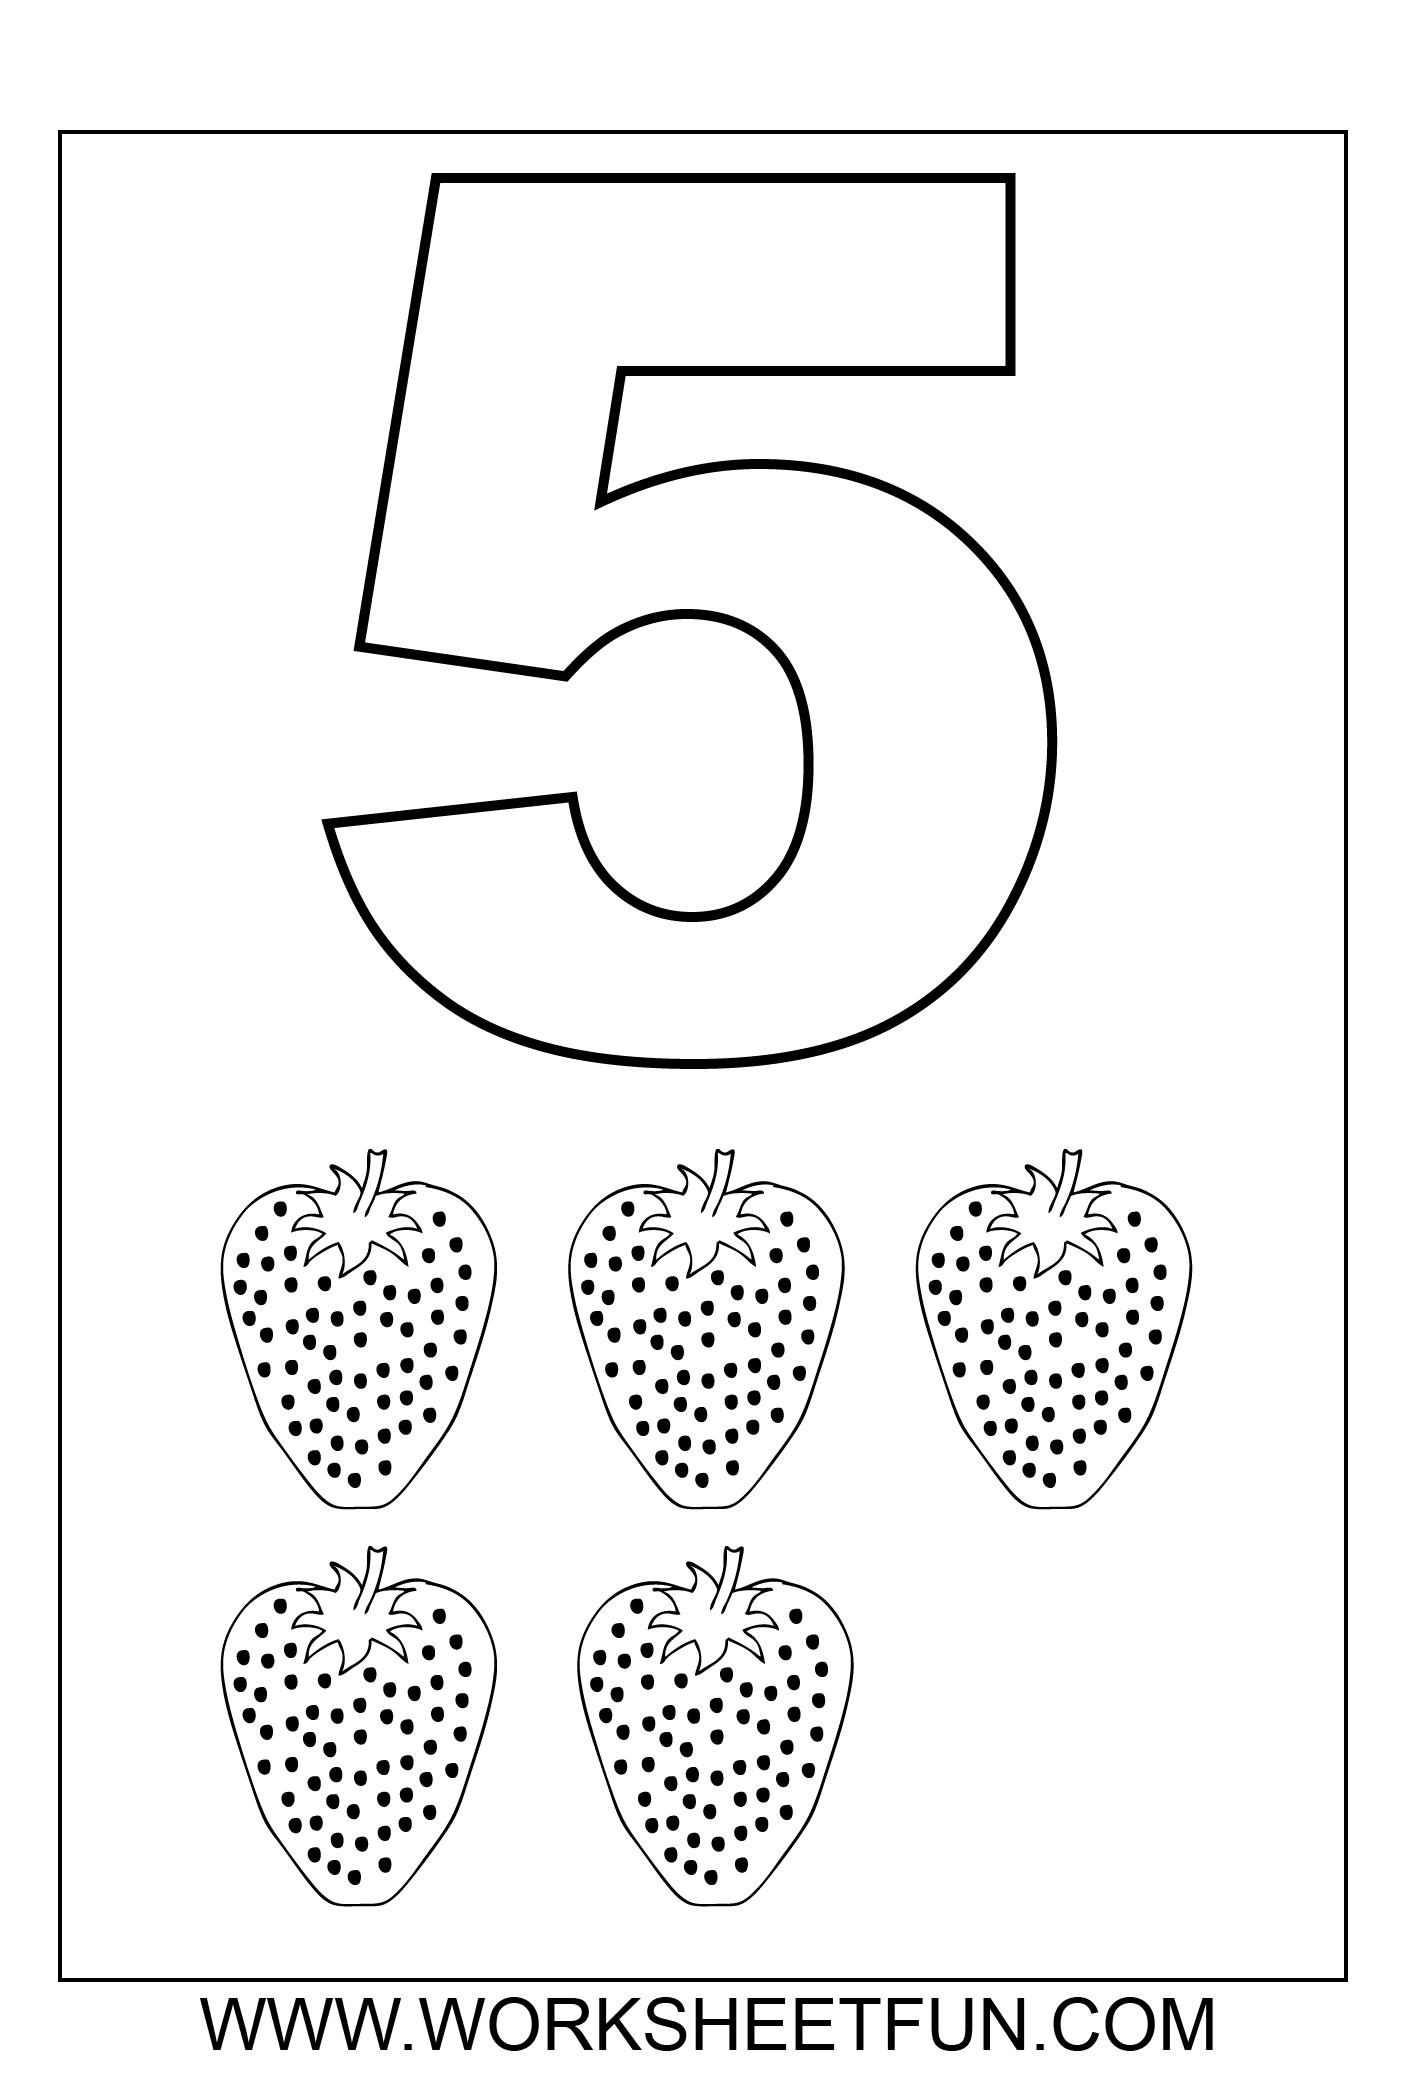 worksheet Tracing Number 5 Worksheets number coloring darzelio mokymui pinterest worksheets 5 pages